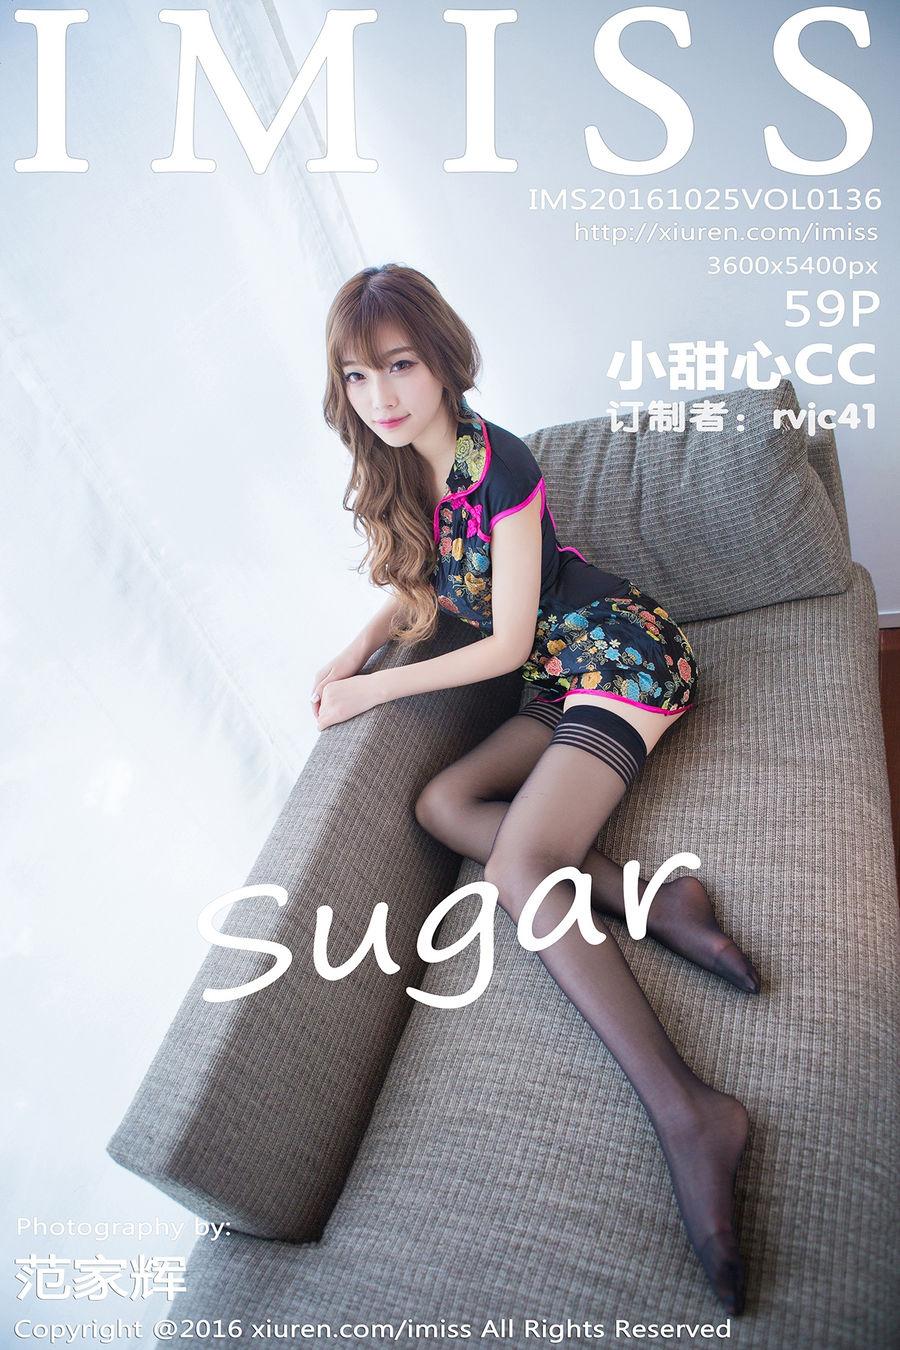 [IMISS爱蜜社] VOL.136 sugar小甜心CC [59+1P/275M]